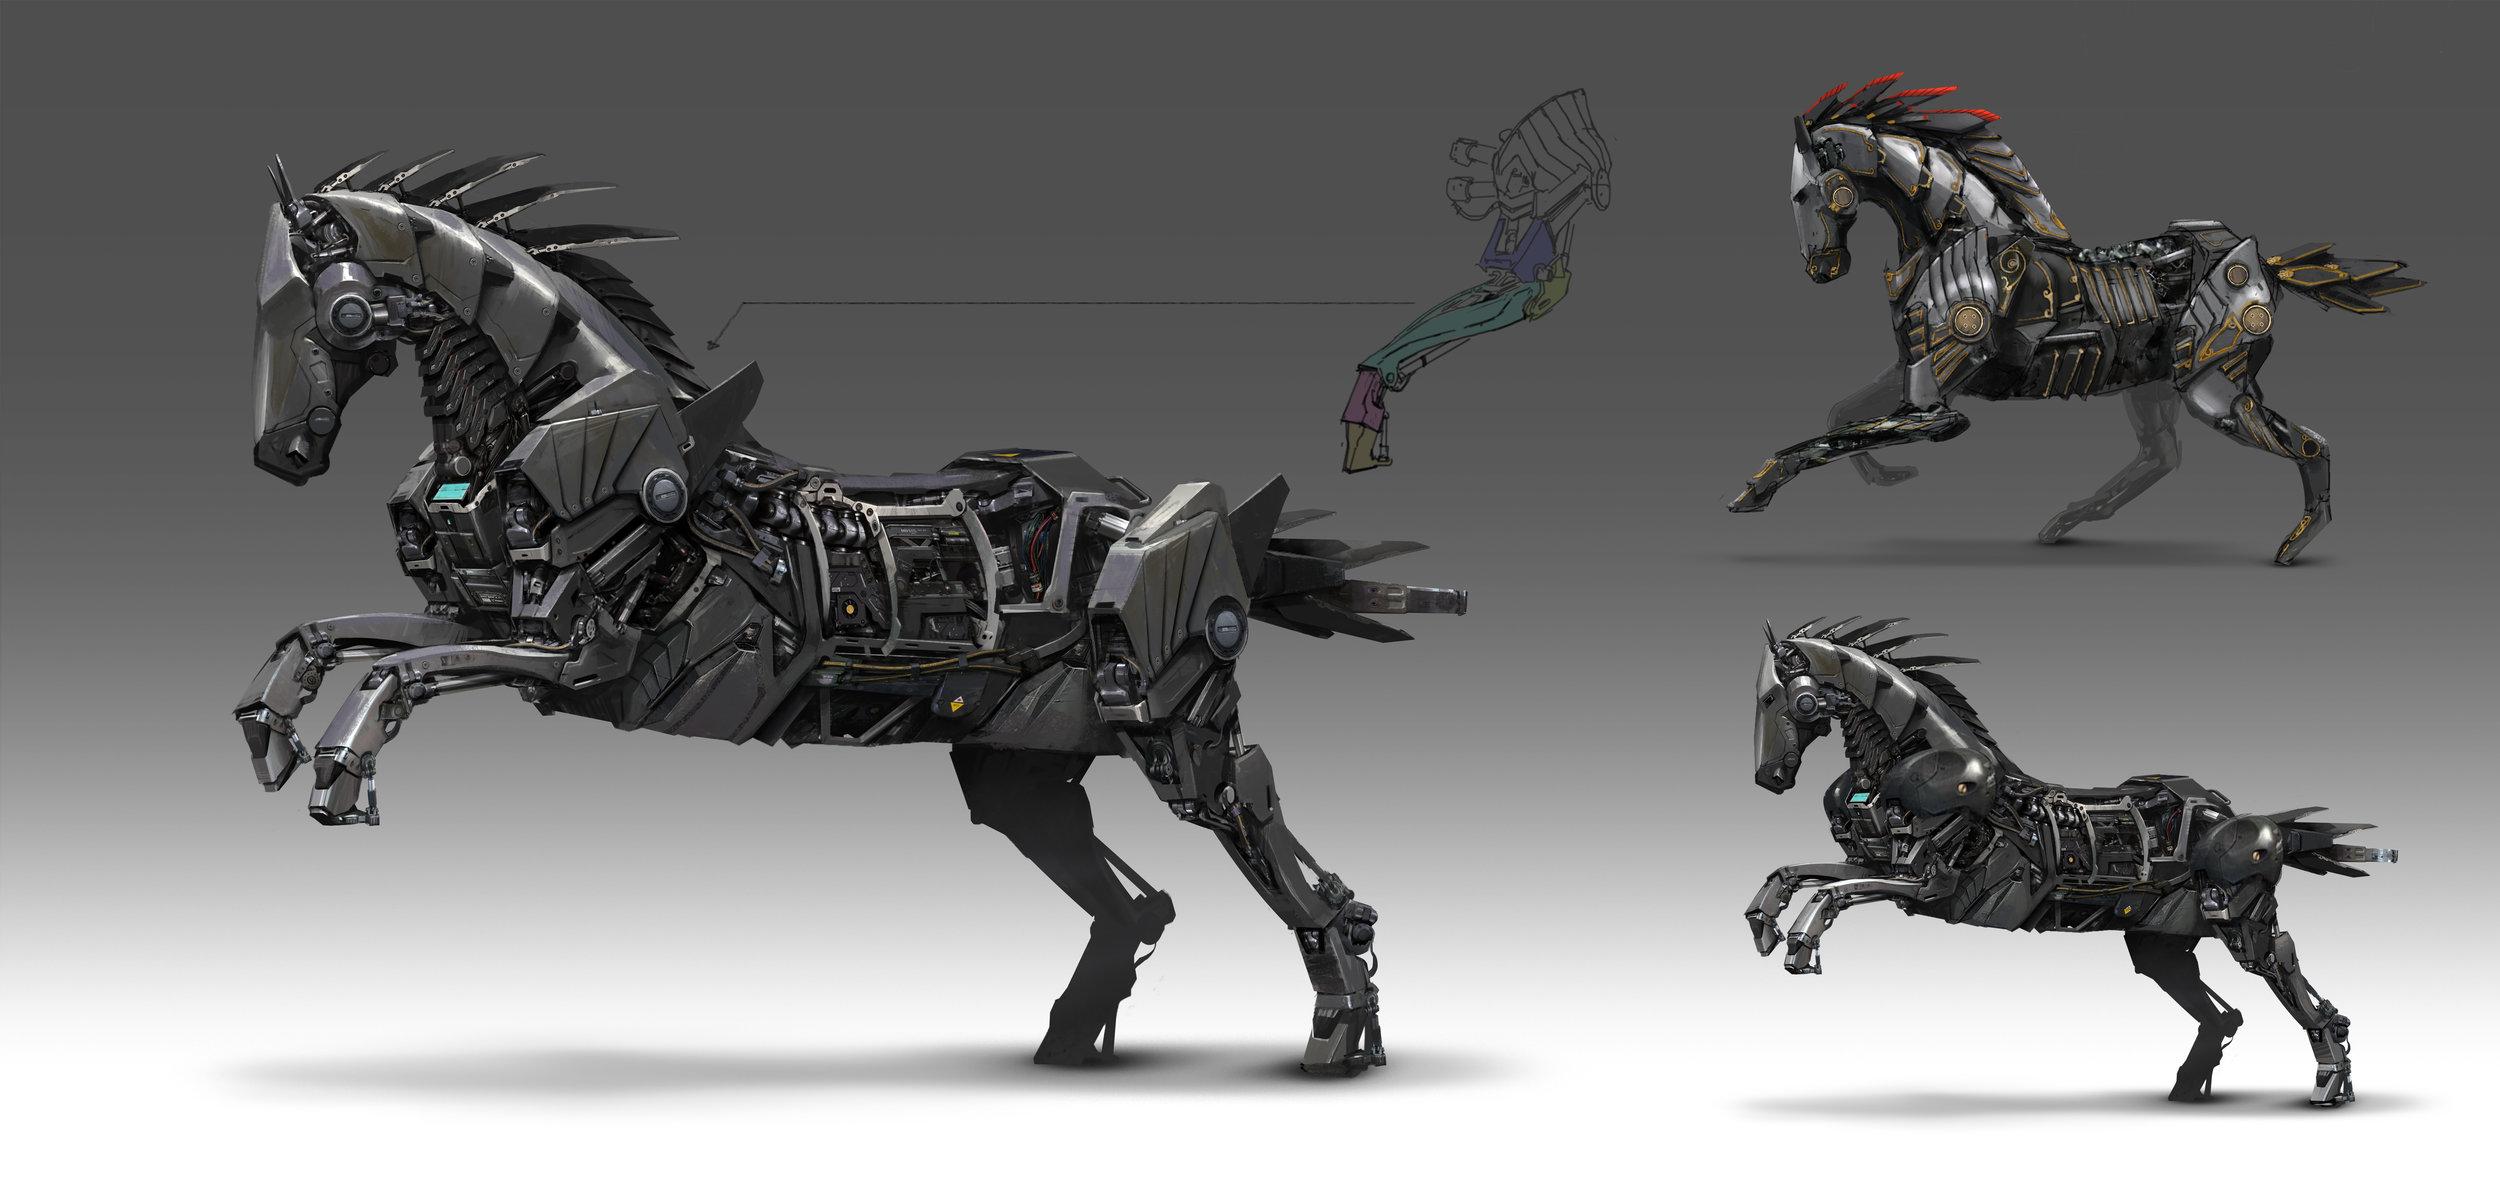 horse_sketch_final.jpg